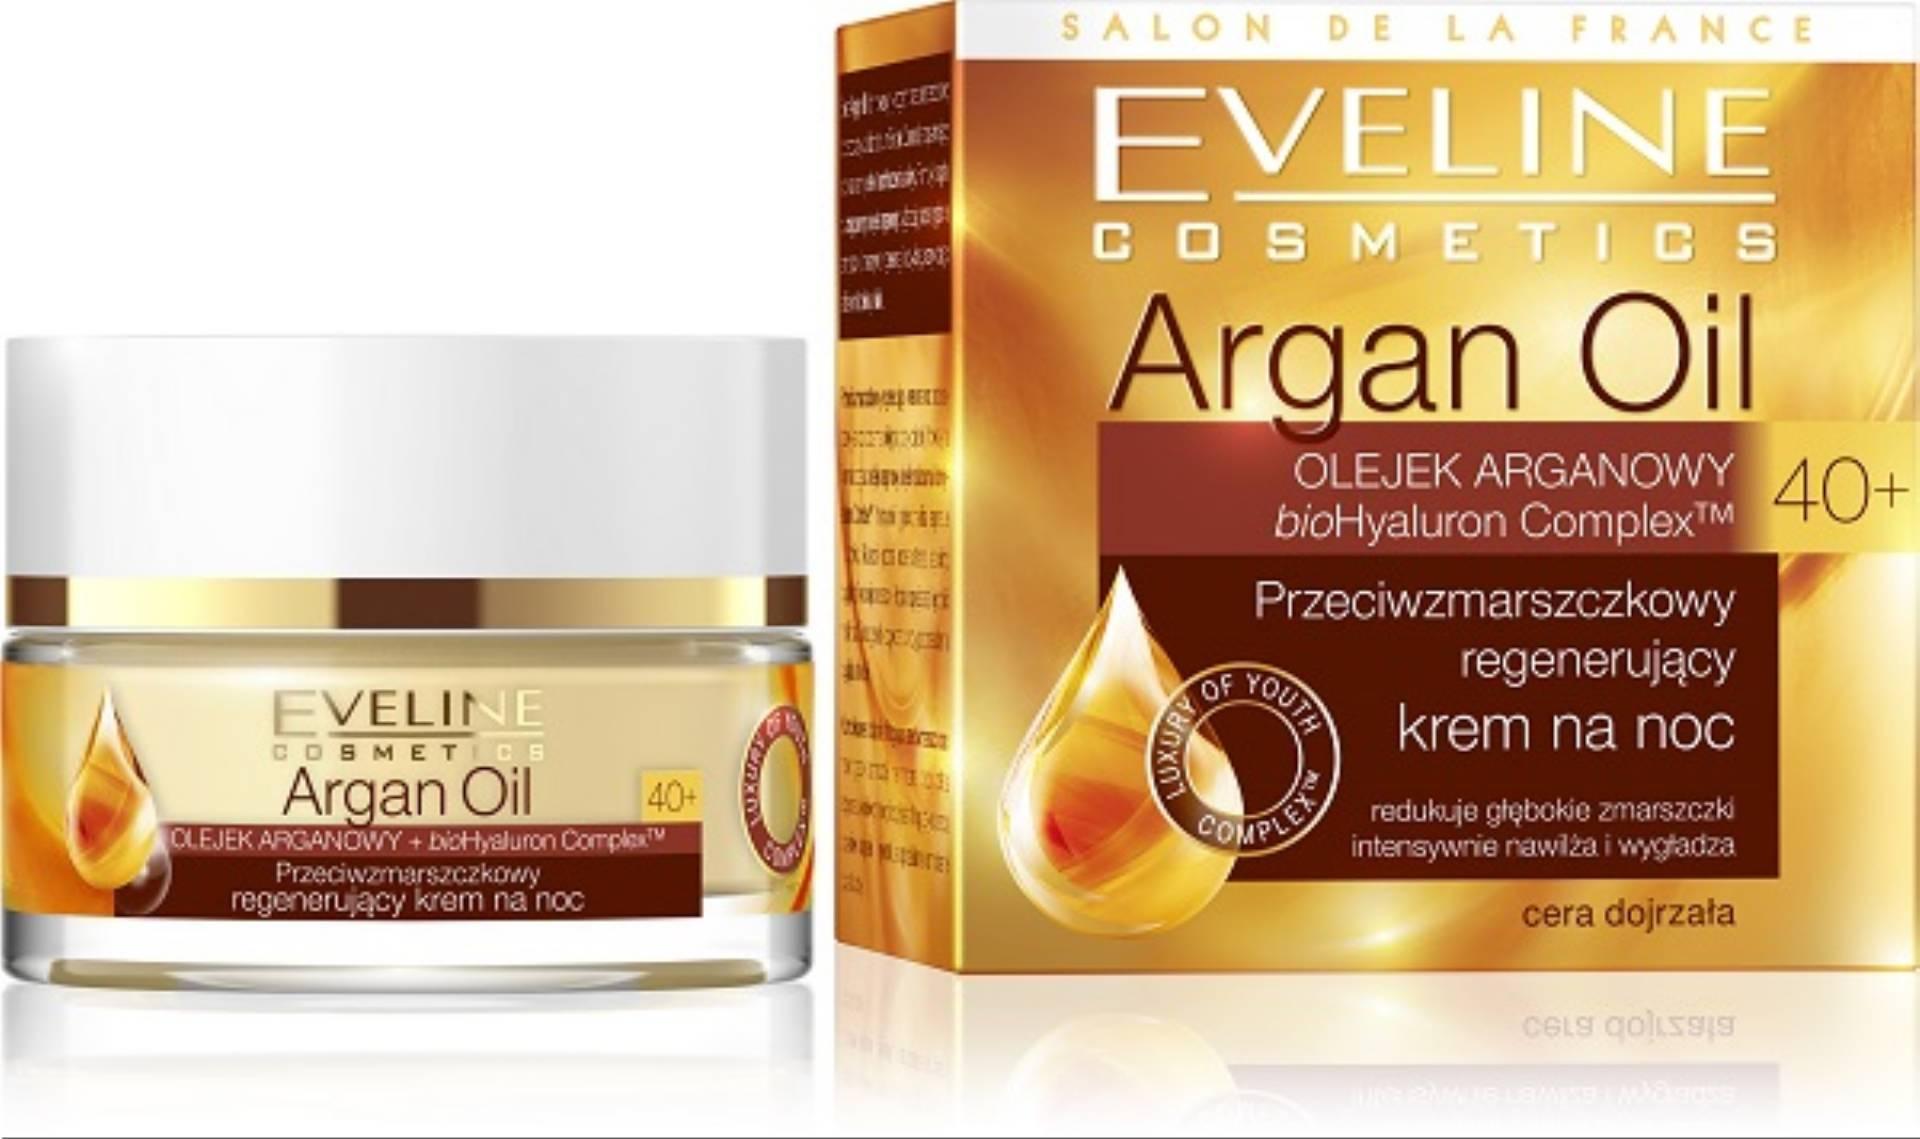 Eveline Cosmetics Argan Oil 40+ - krem na noc